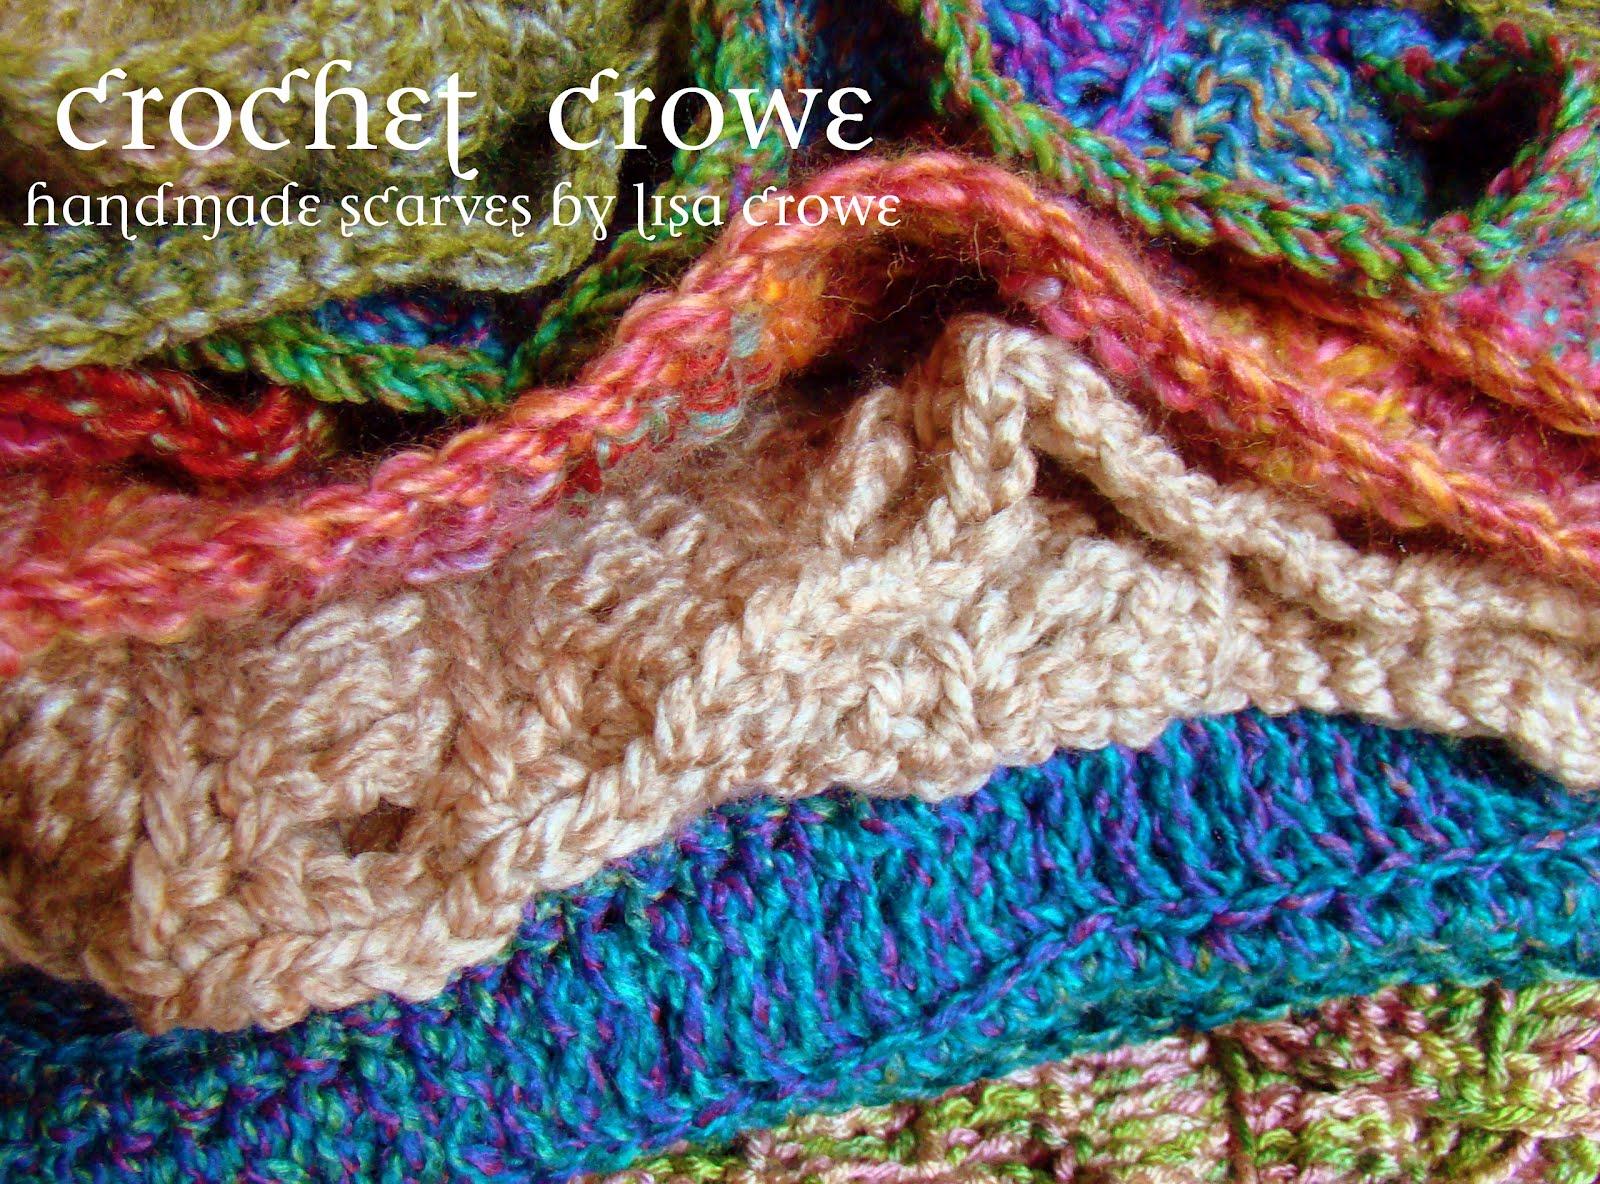 Crochet Crowe